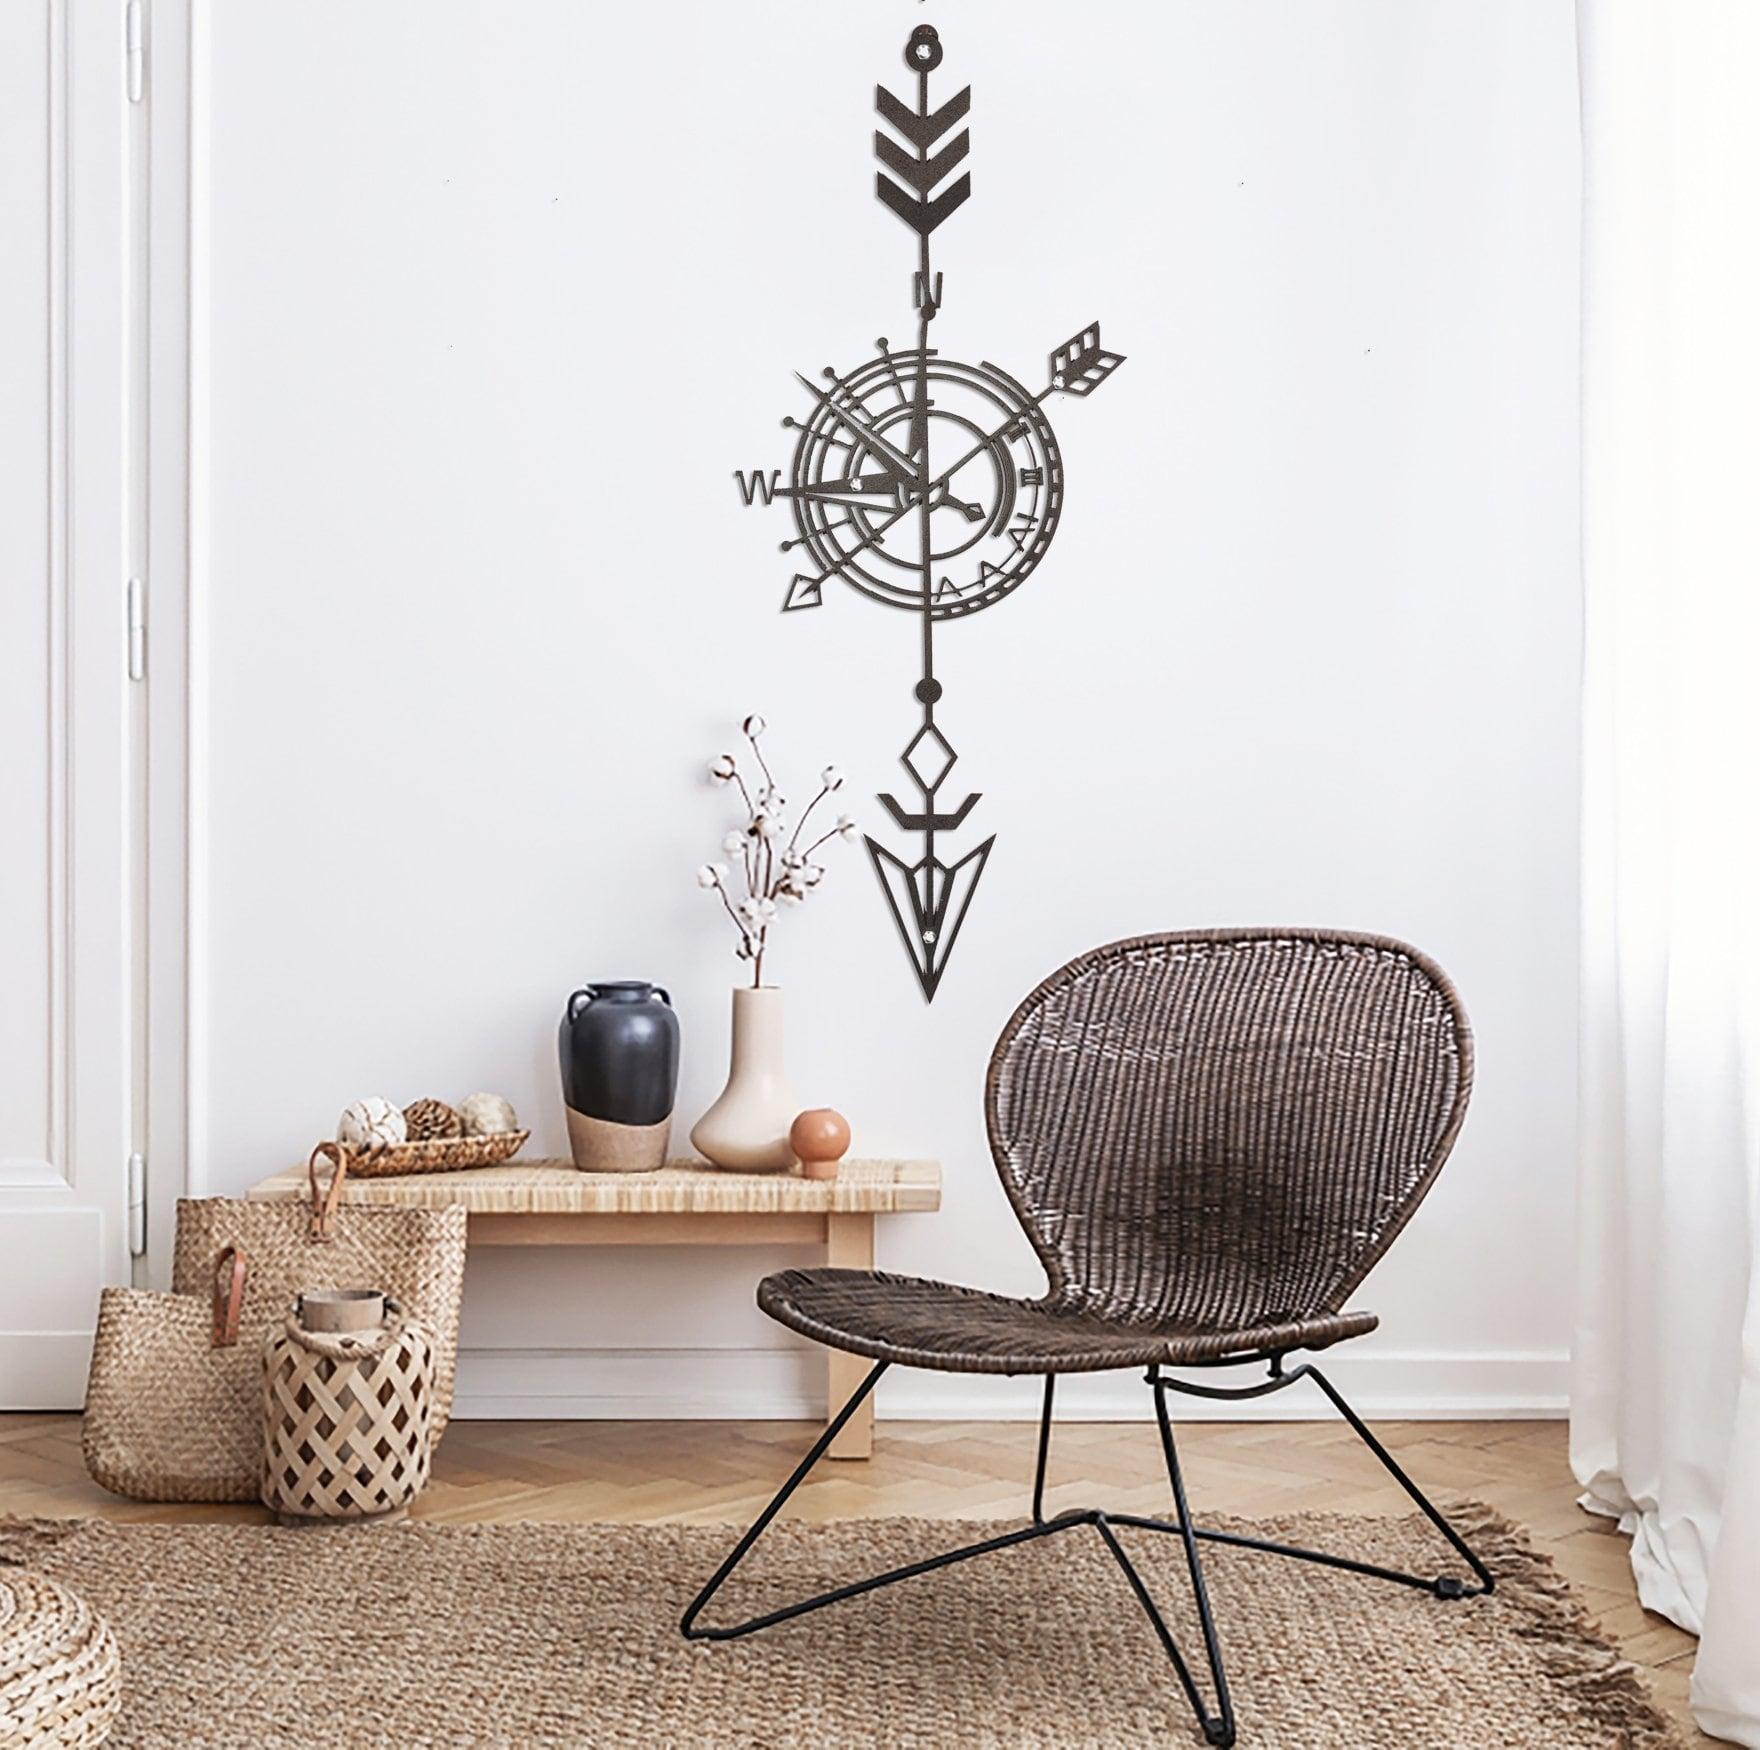 Compas decoration in metal for a unique interior